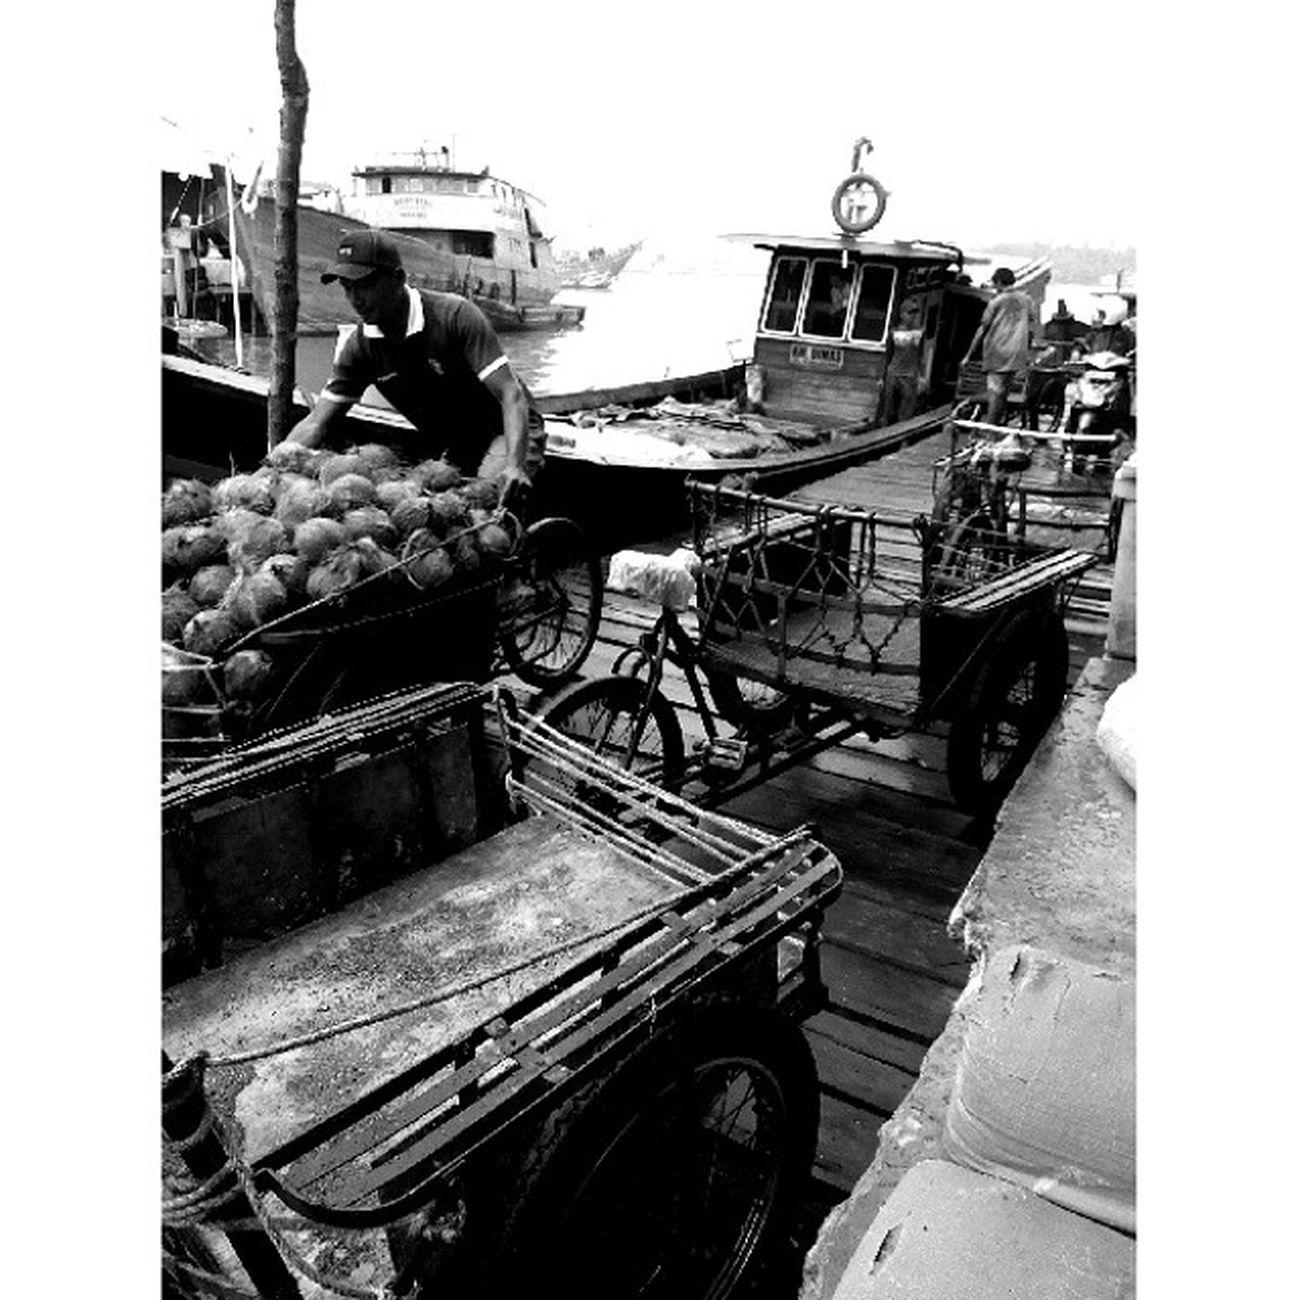 Kehidupan dipasar Tradisional pelantar kota Tanjungpinang dikala sedang bongkar muat barang .... Lenovo_s920camera Photobyphone_myproject Blackandwhitephoto Wonderfullkepri Humanityphotography People Humaninterestphotography Portraiturephotography Streetphotography Wonderfullindonesia IndonesiaOnly Ig_nesia Photooftheday Thephotosociety Traditional